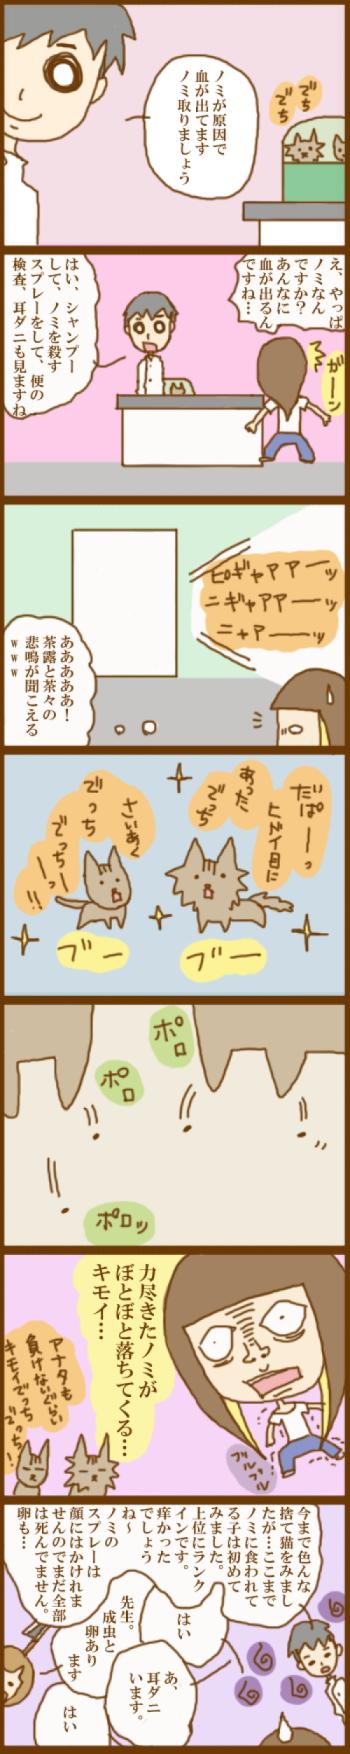 f:id:suzuokayu:20201120115955j:plain